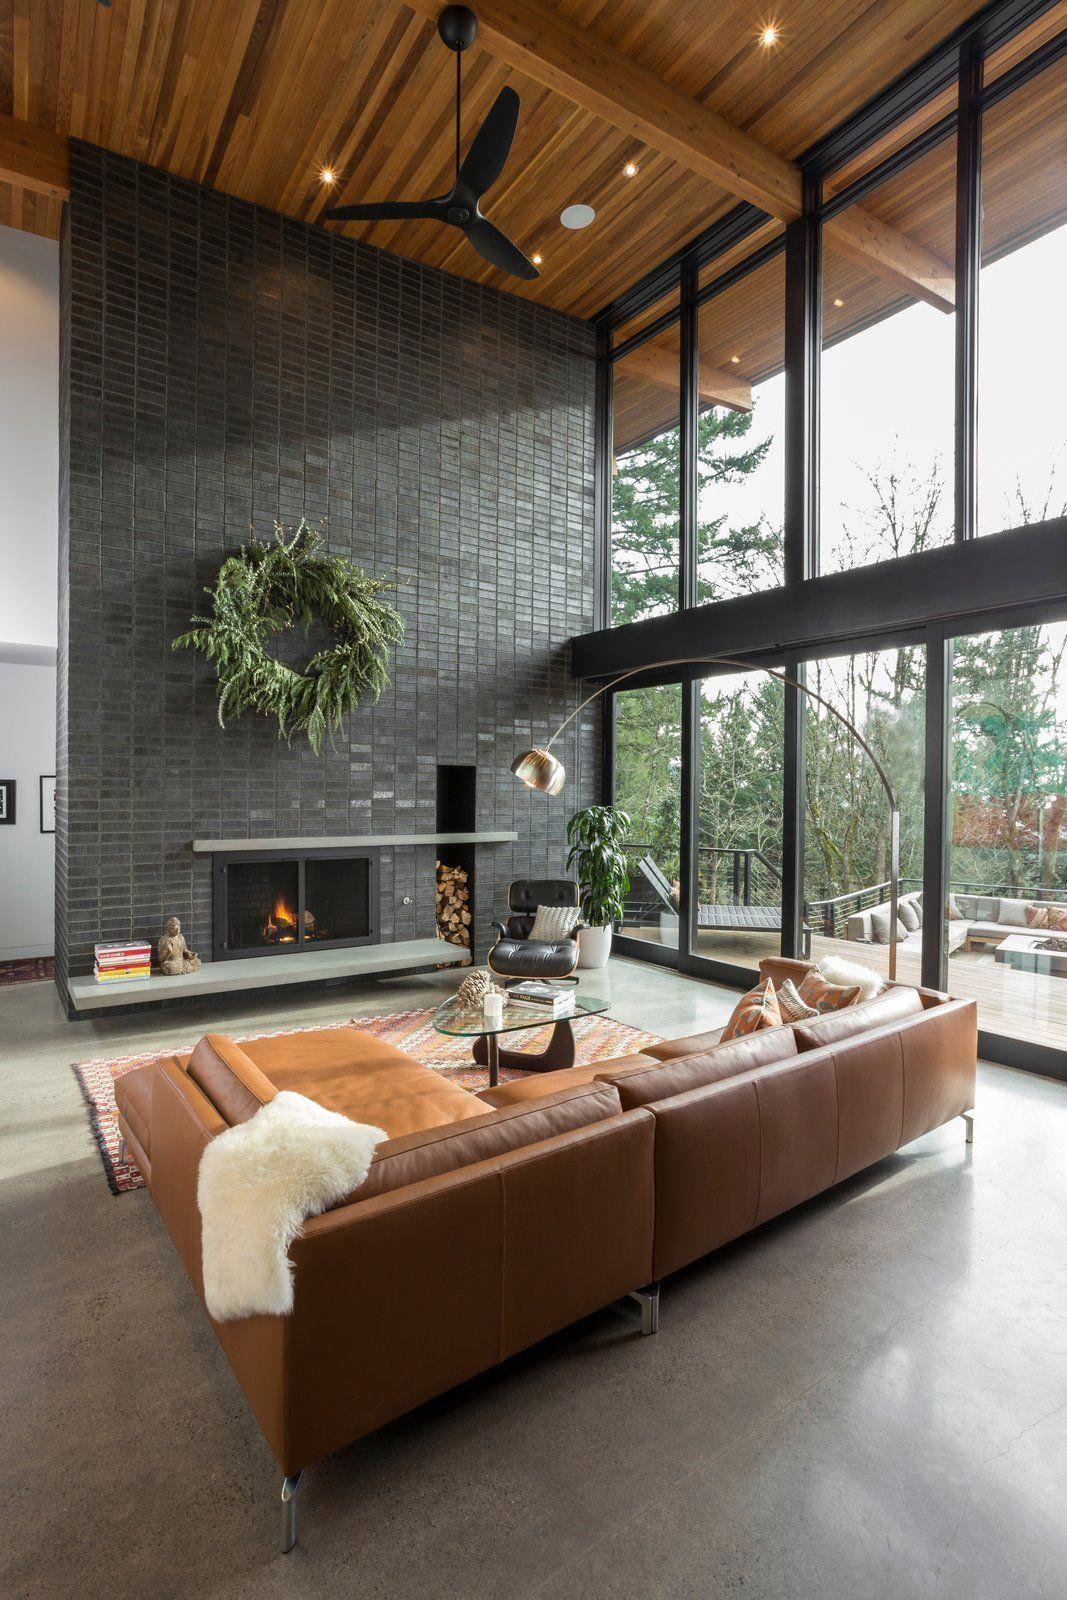 Get The Best Mid Century Home Decor Ideas Www Delightfull Eu Visit For Dining Room Ideas Mid Modern House Design House Interior Living Room Decor Modern